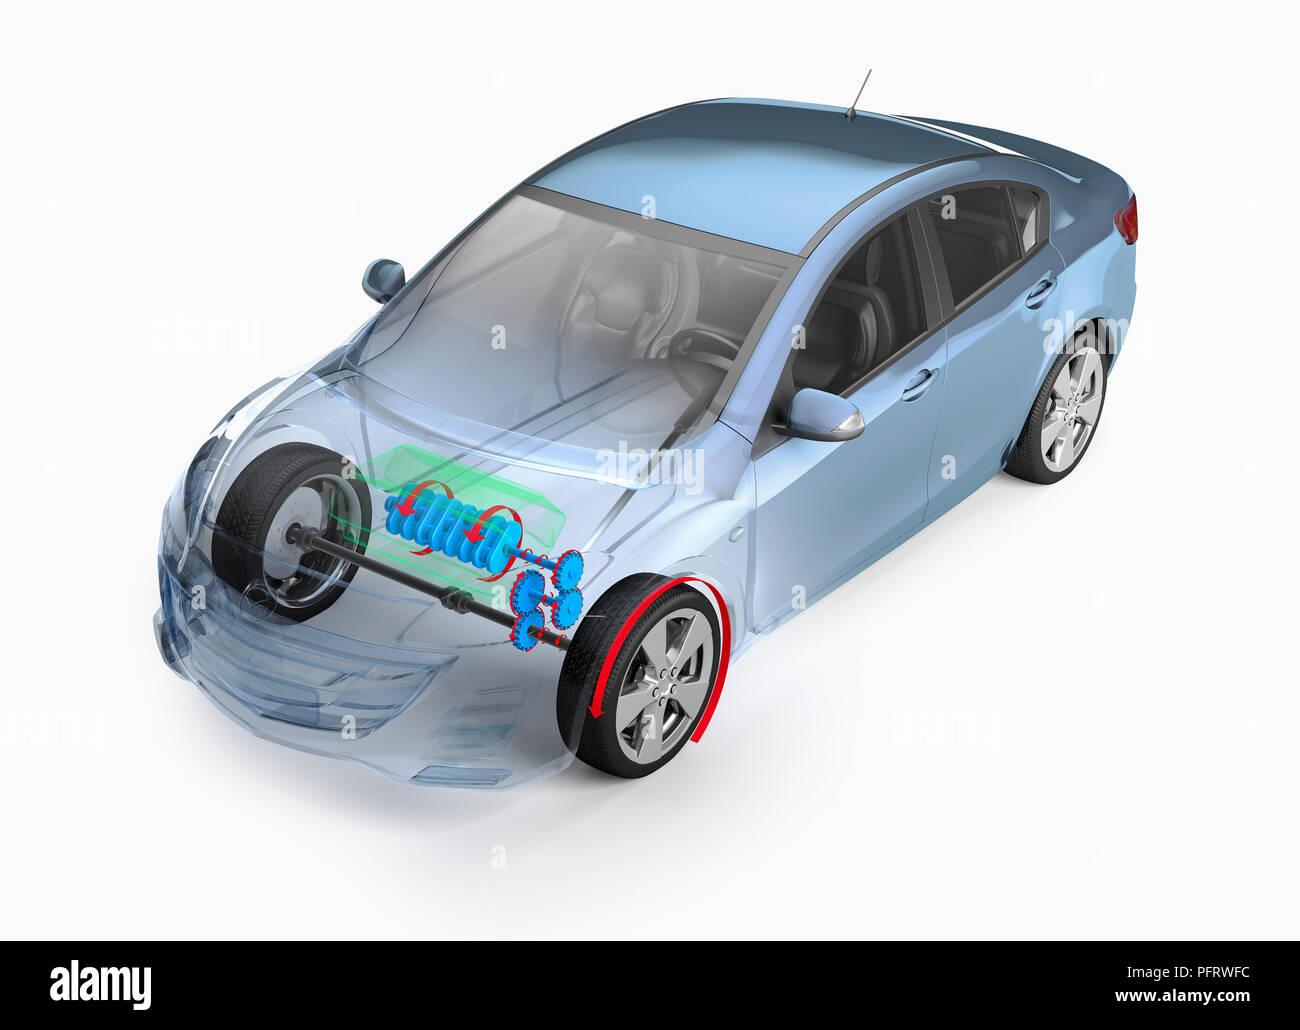 Illustration, internal mechanisms of a car - Stock Image